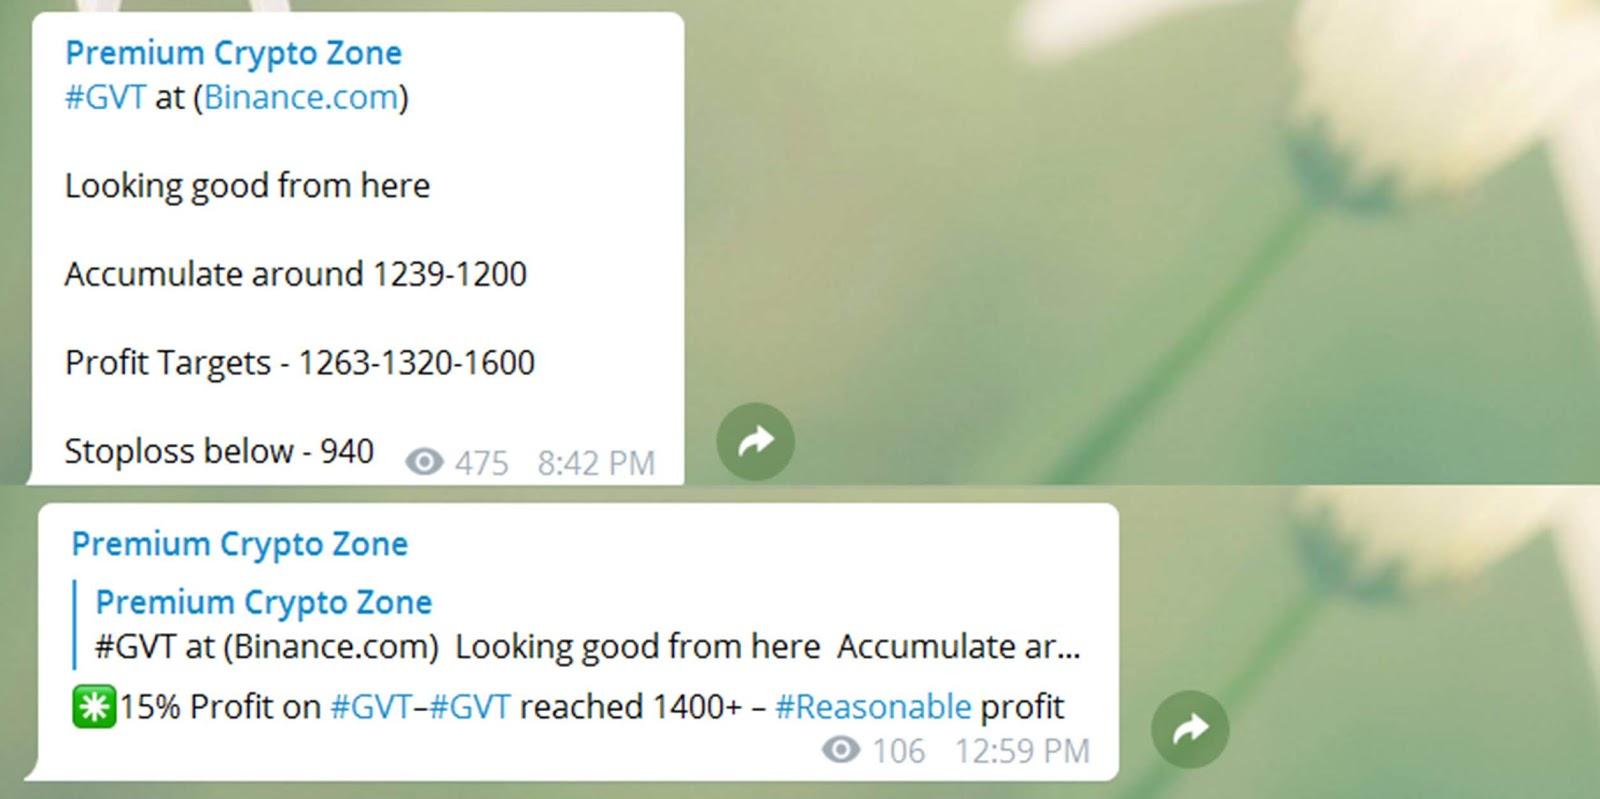 bester handelstag bot trading currency futures vs spot